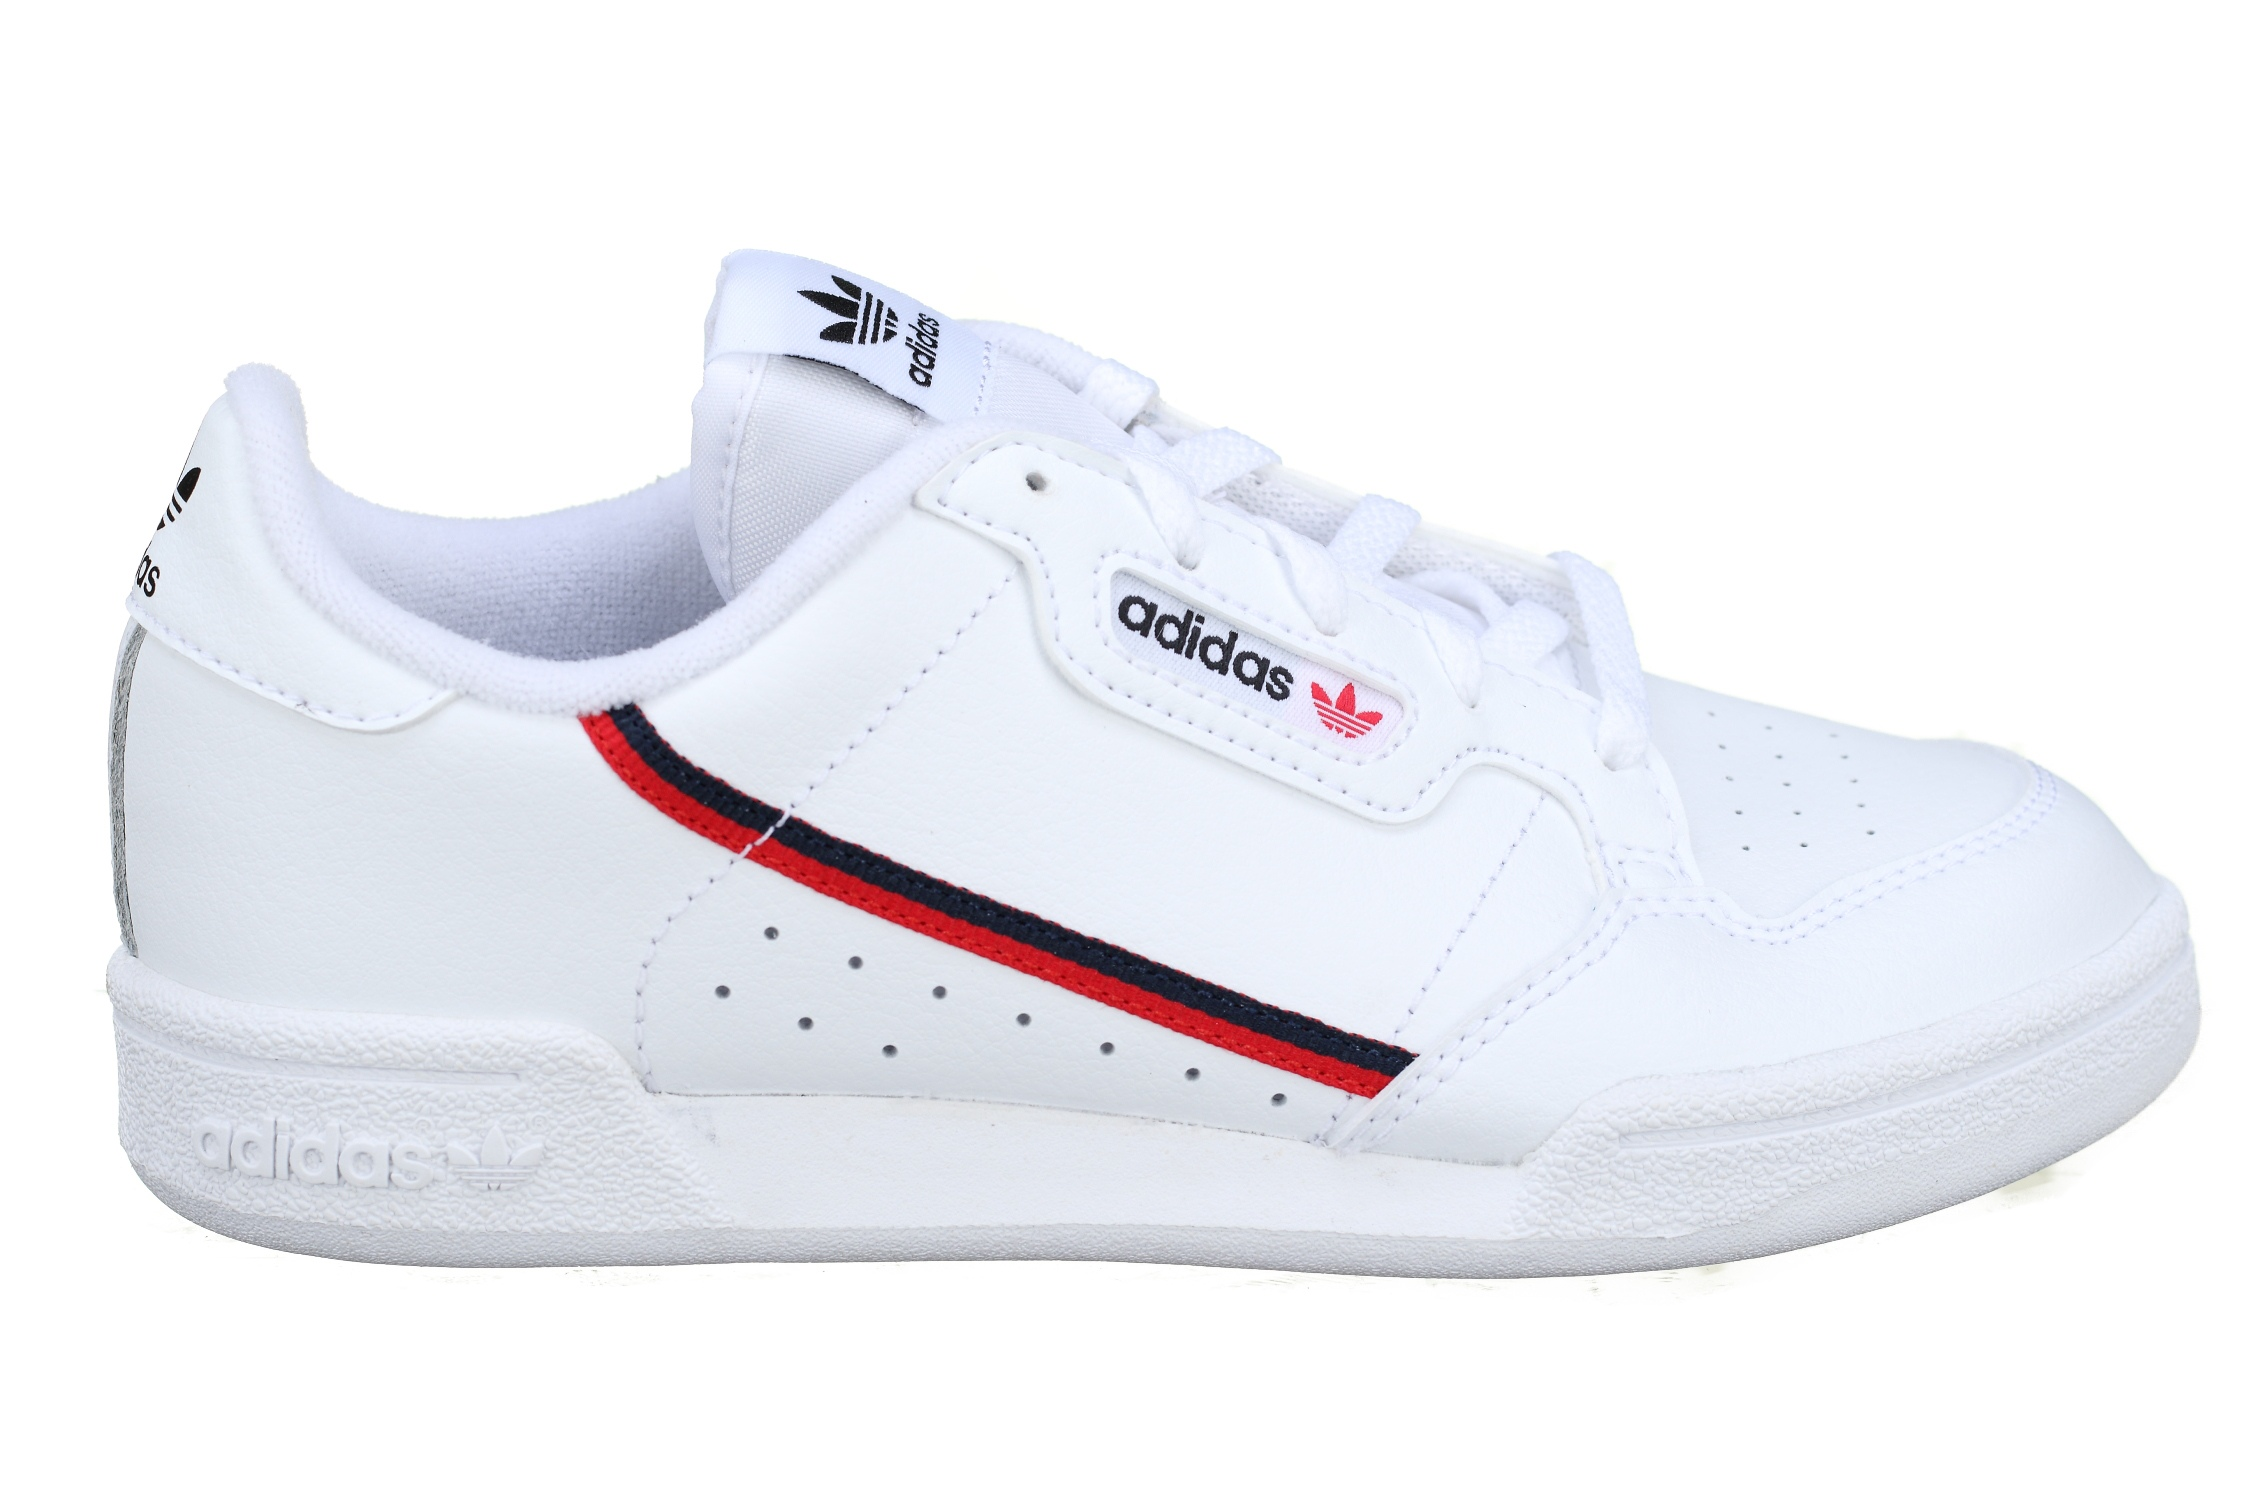 http://www.leadermode.com/163138/adidas-continental-80-c-g28215-blanc.jpg